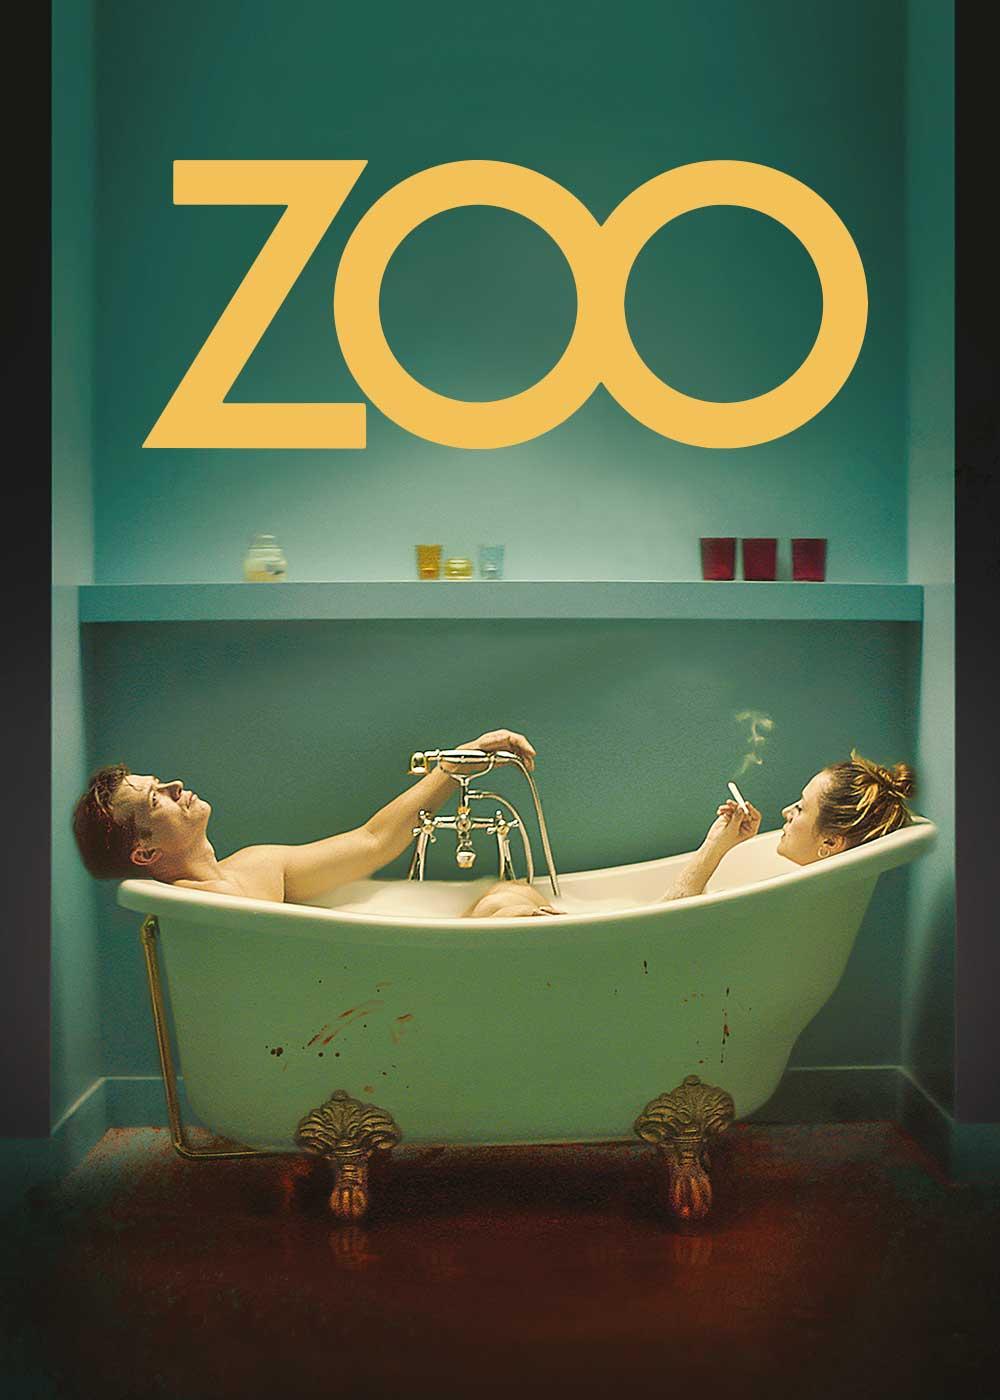 zoo_poster.jpg